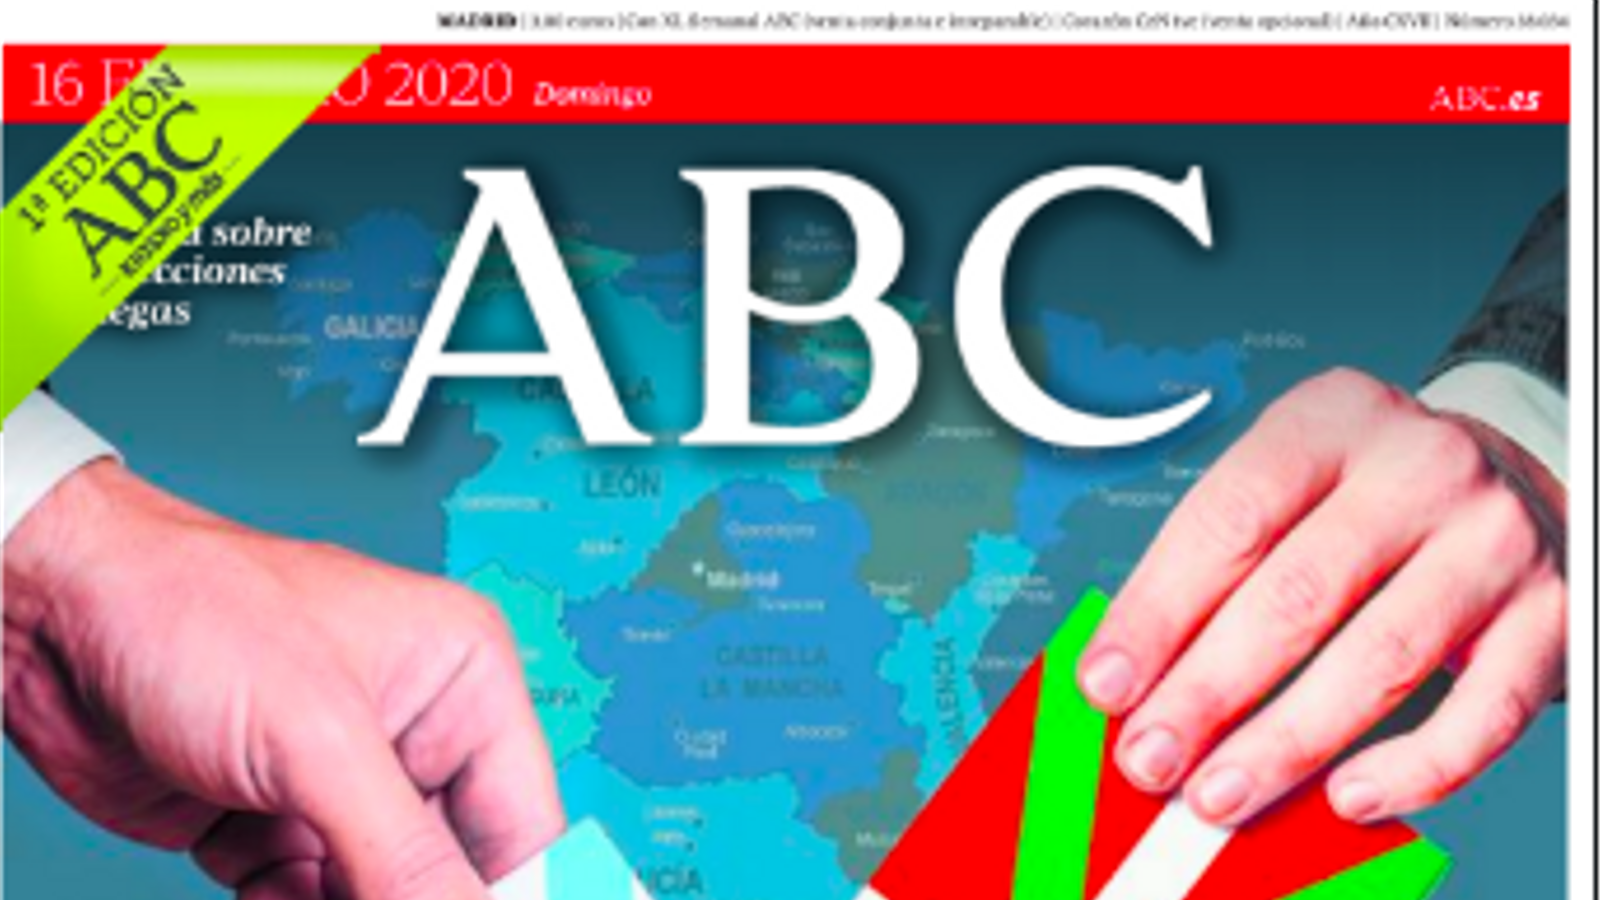 ABC 16/02/2020 Abc